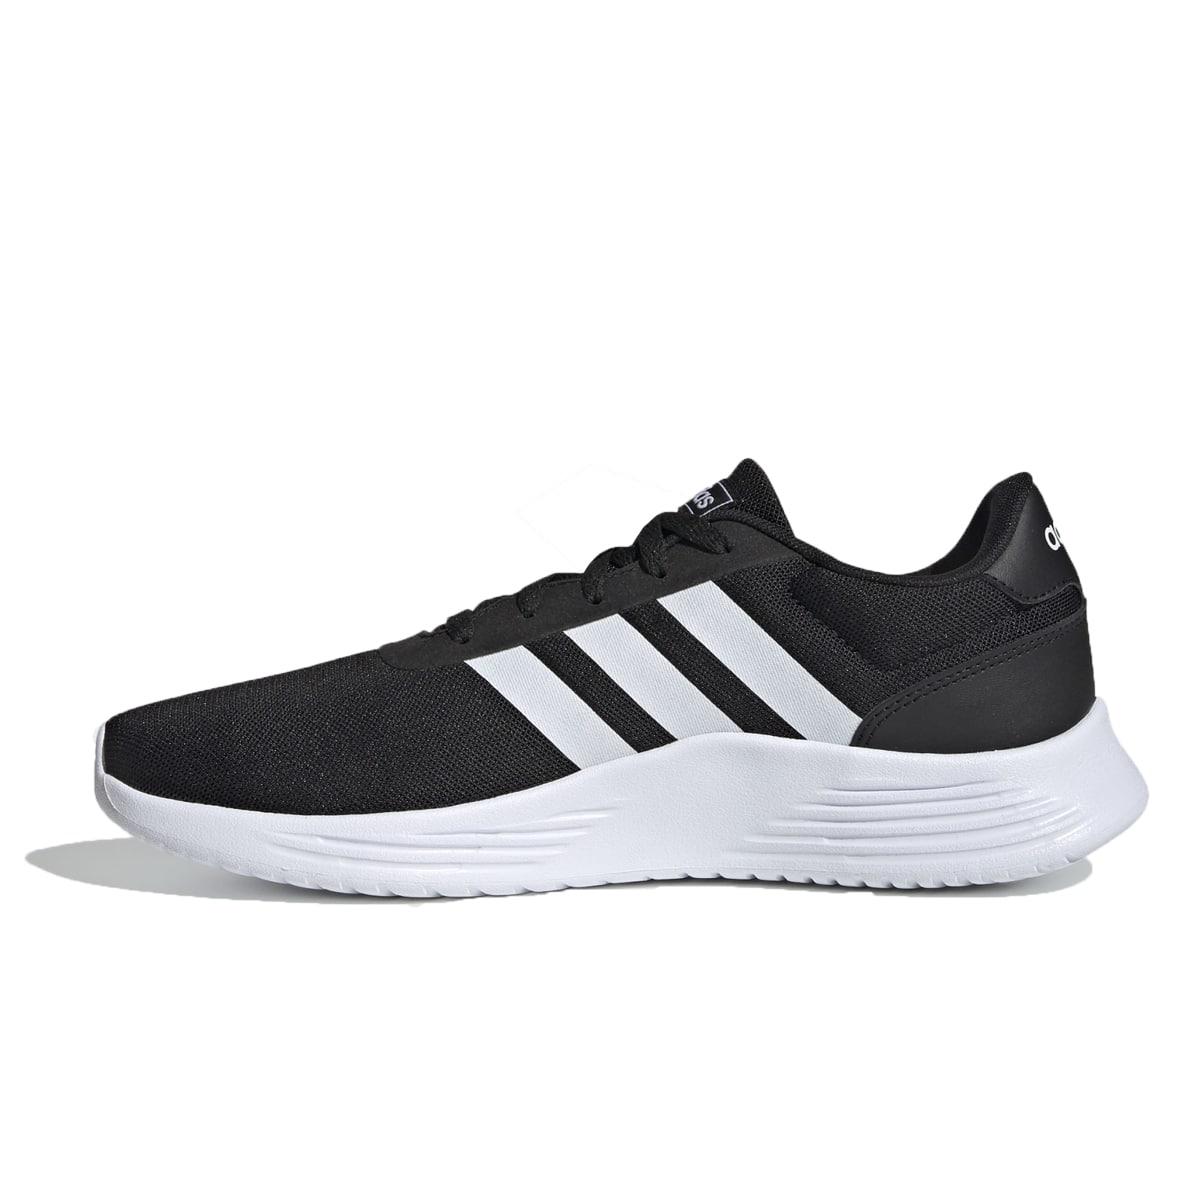 Tênis Masc Lite Ricer EG3283 Adidas